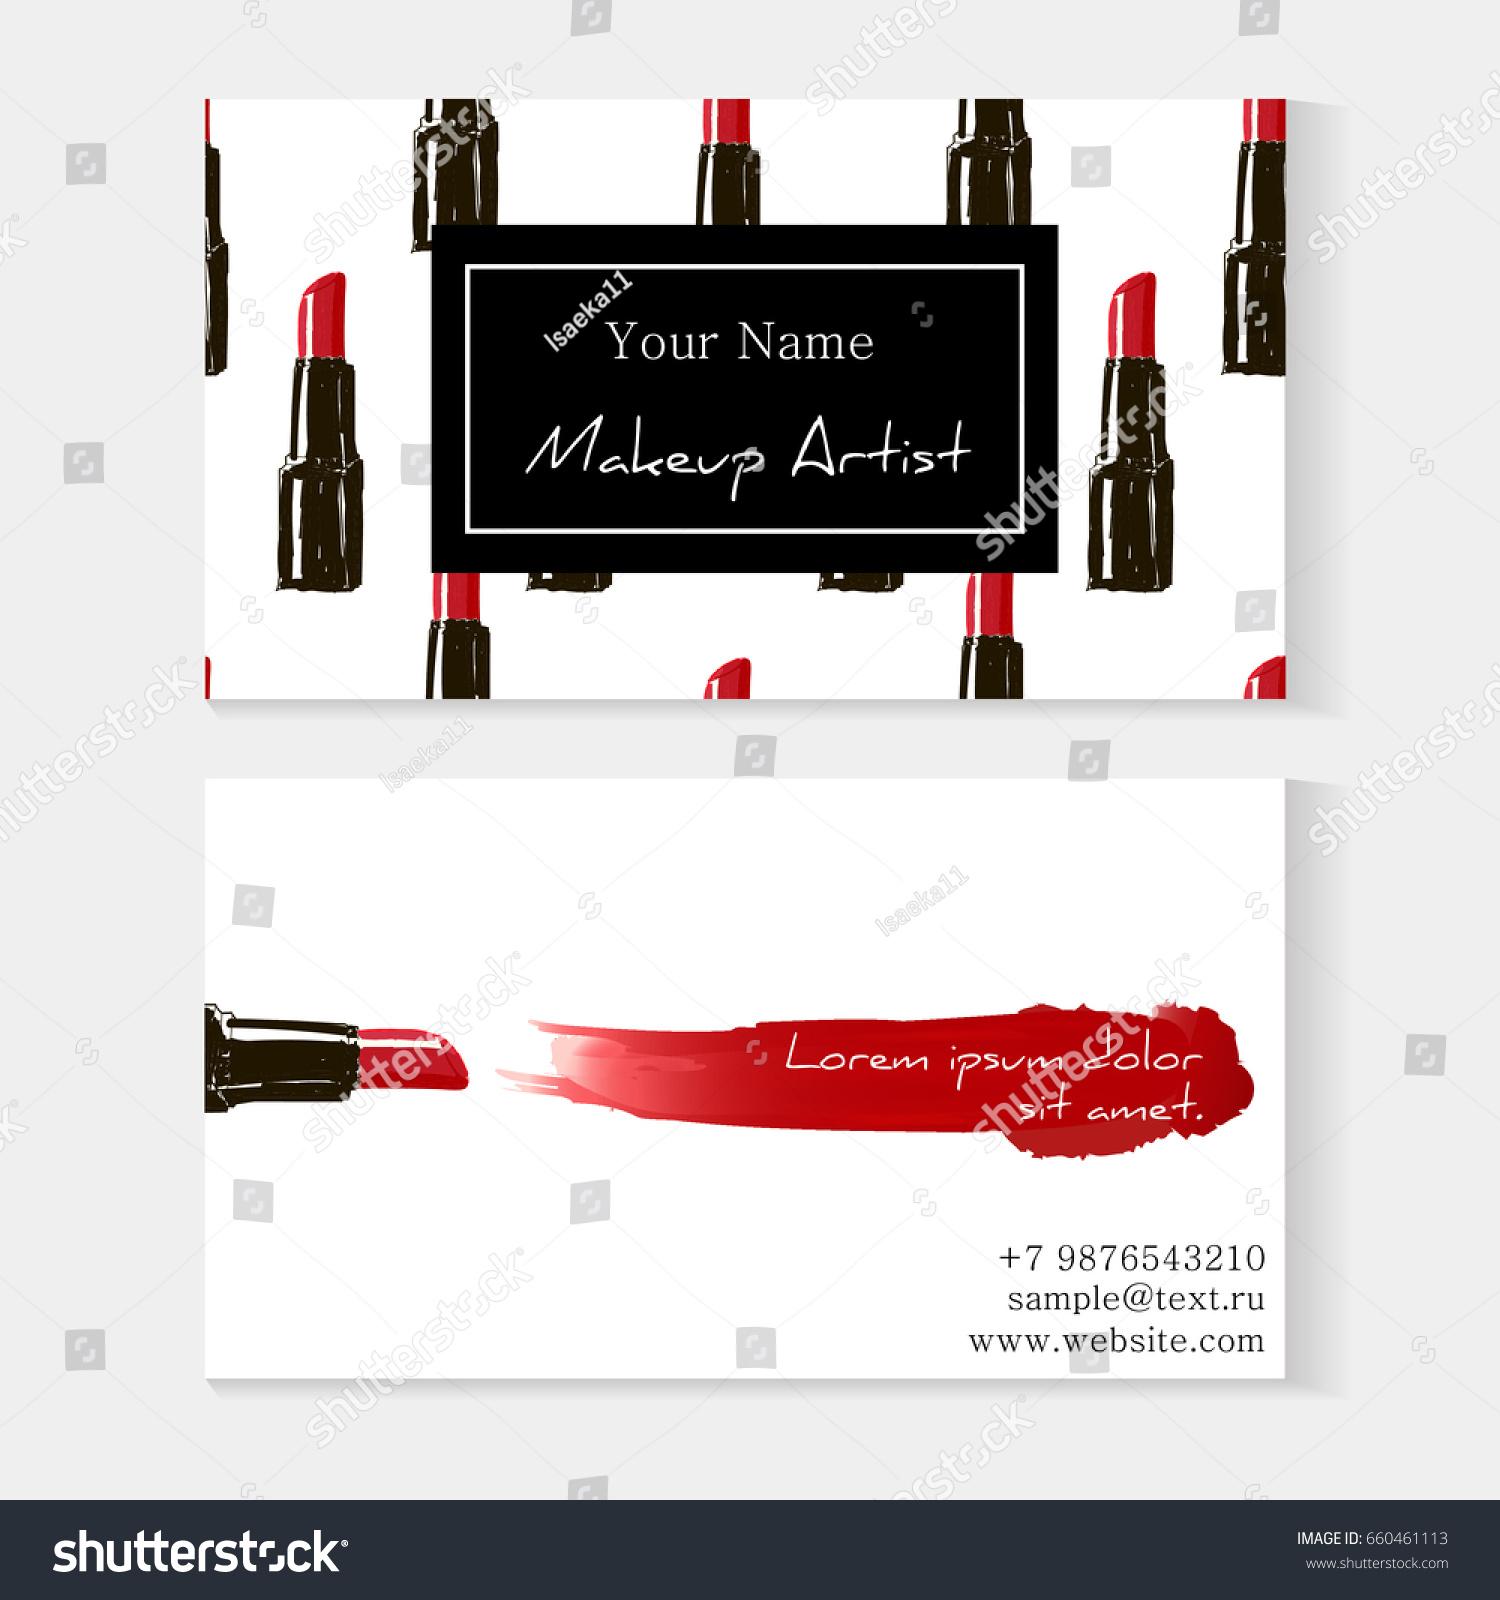 Makeup Artist Business Card Template Red Stock Vector (2018 ...